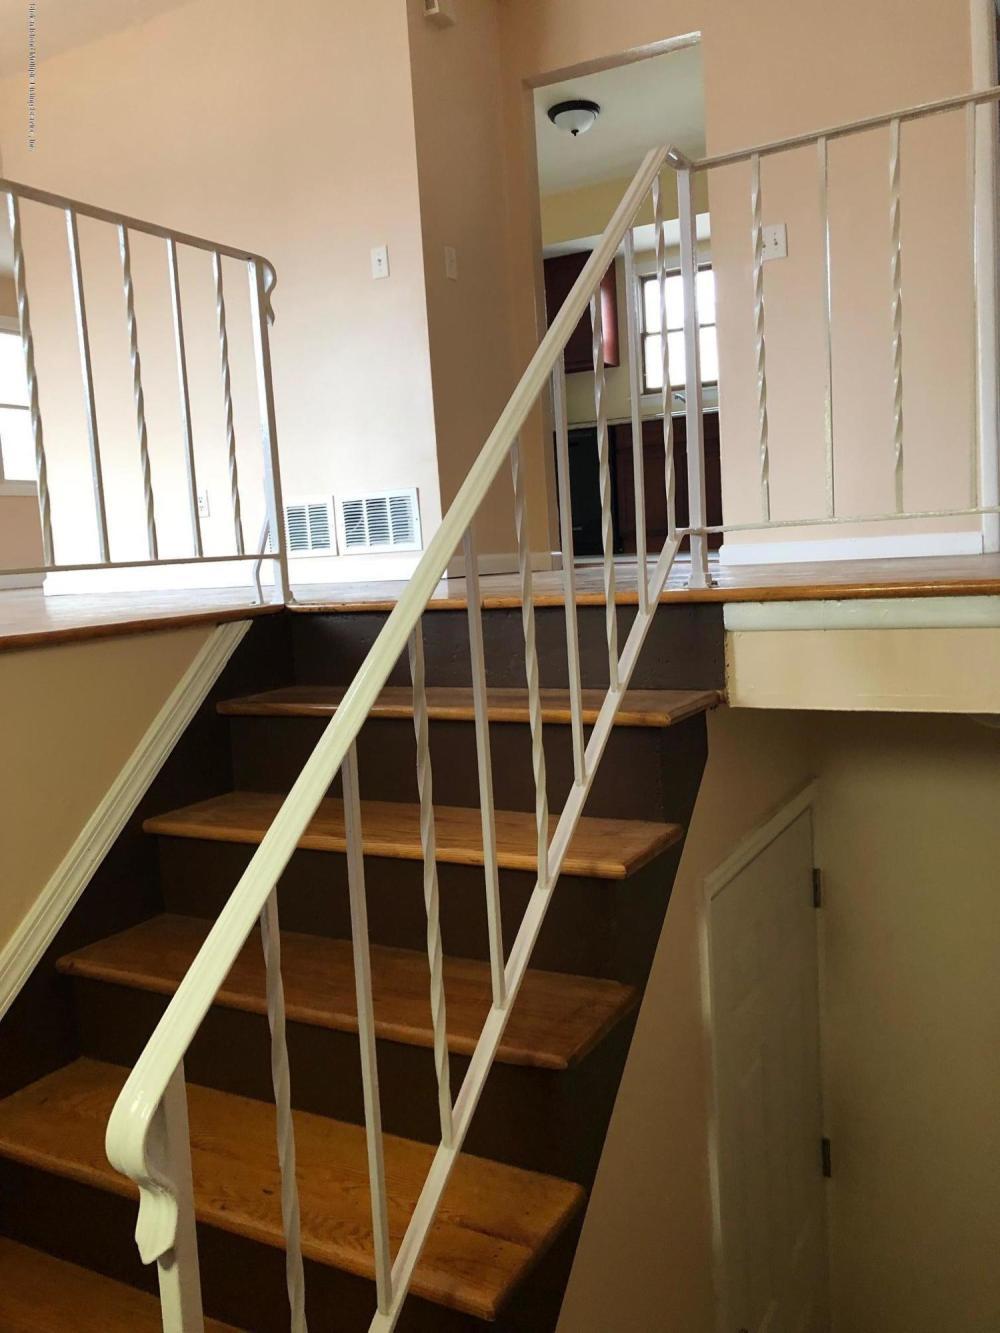 Apt 2 110 Moffett Street,Staten Island,New York,10312,United States,3 Bedrooms Bedrooms,6 Rooms Rooms,2 BathroomsBathrooms,Res-Rental,Moffett,1124437